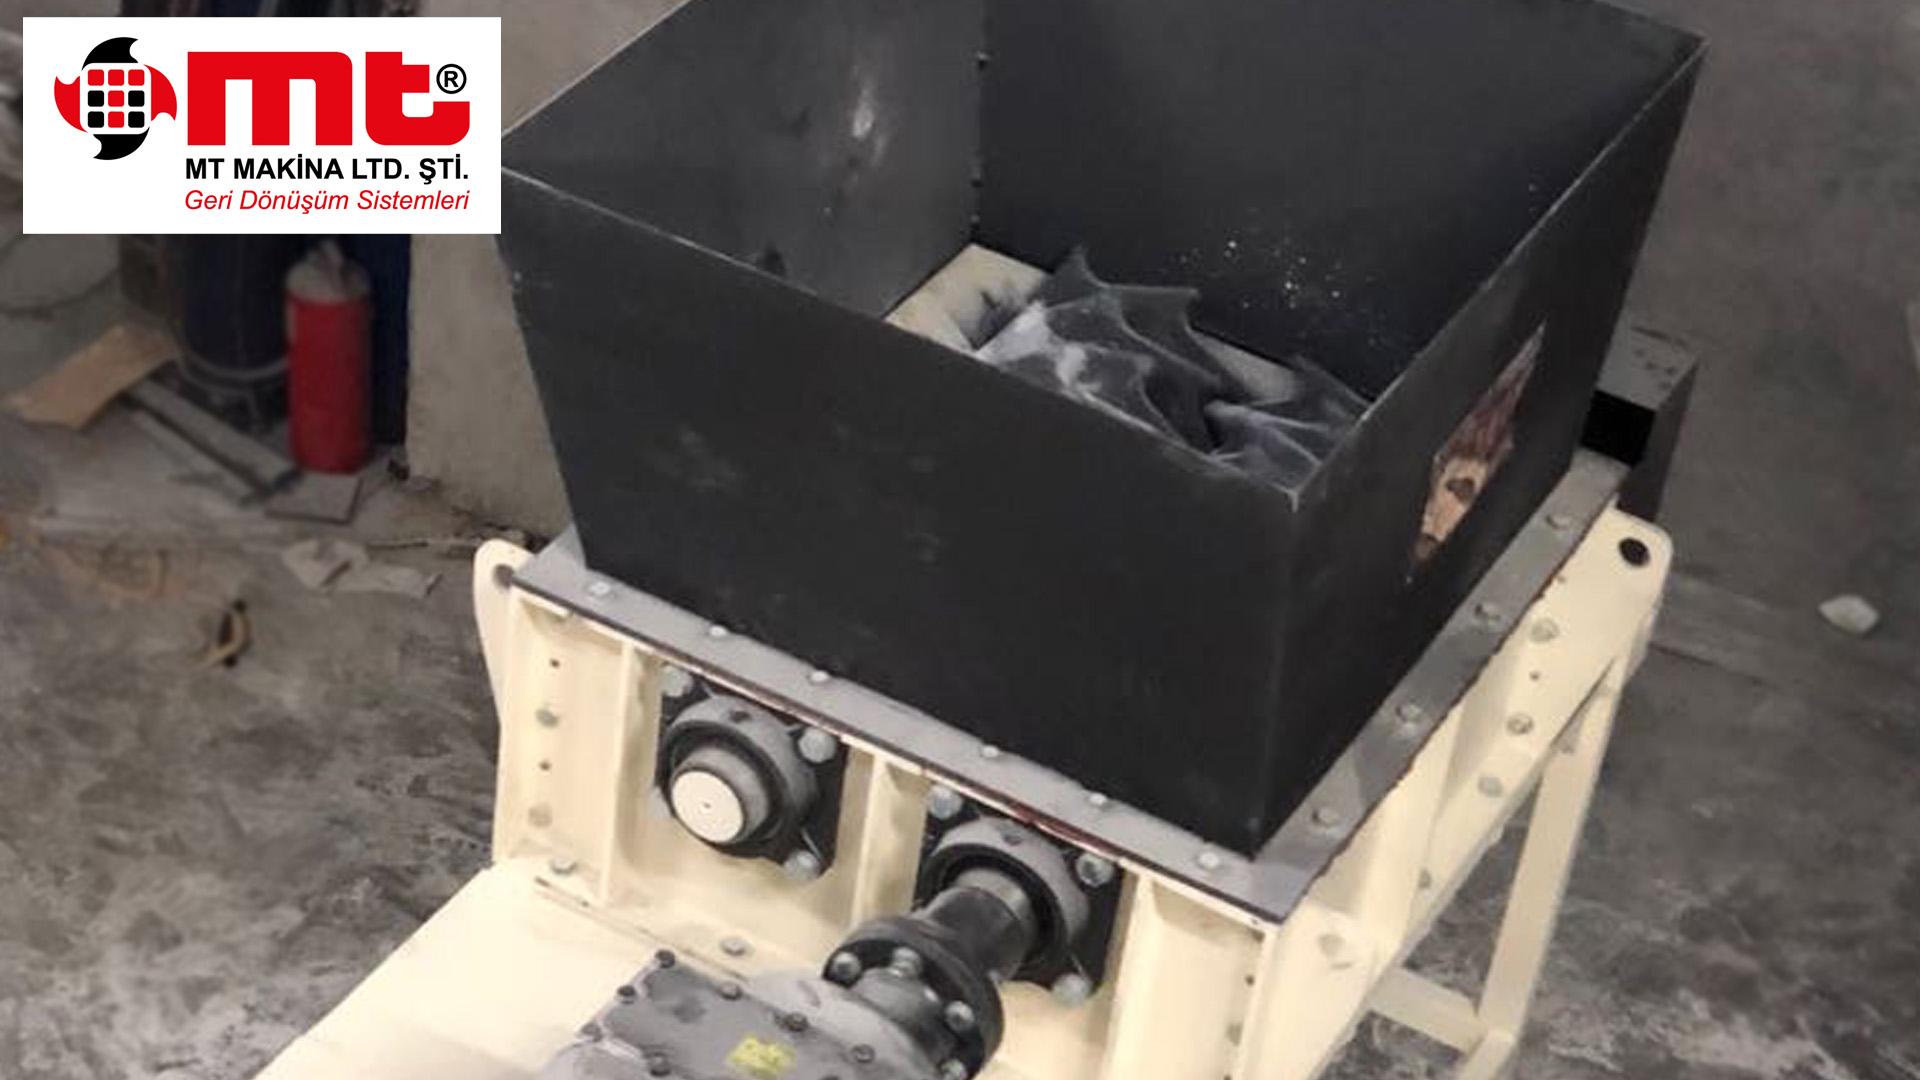 Packaging Separating Shredder Unit